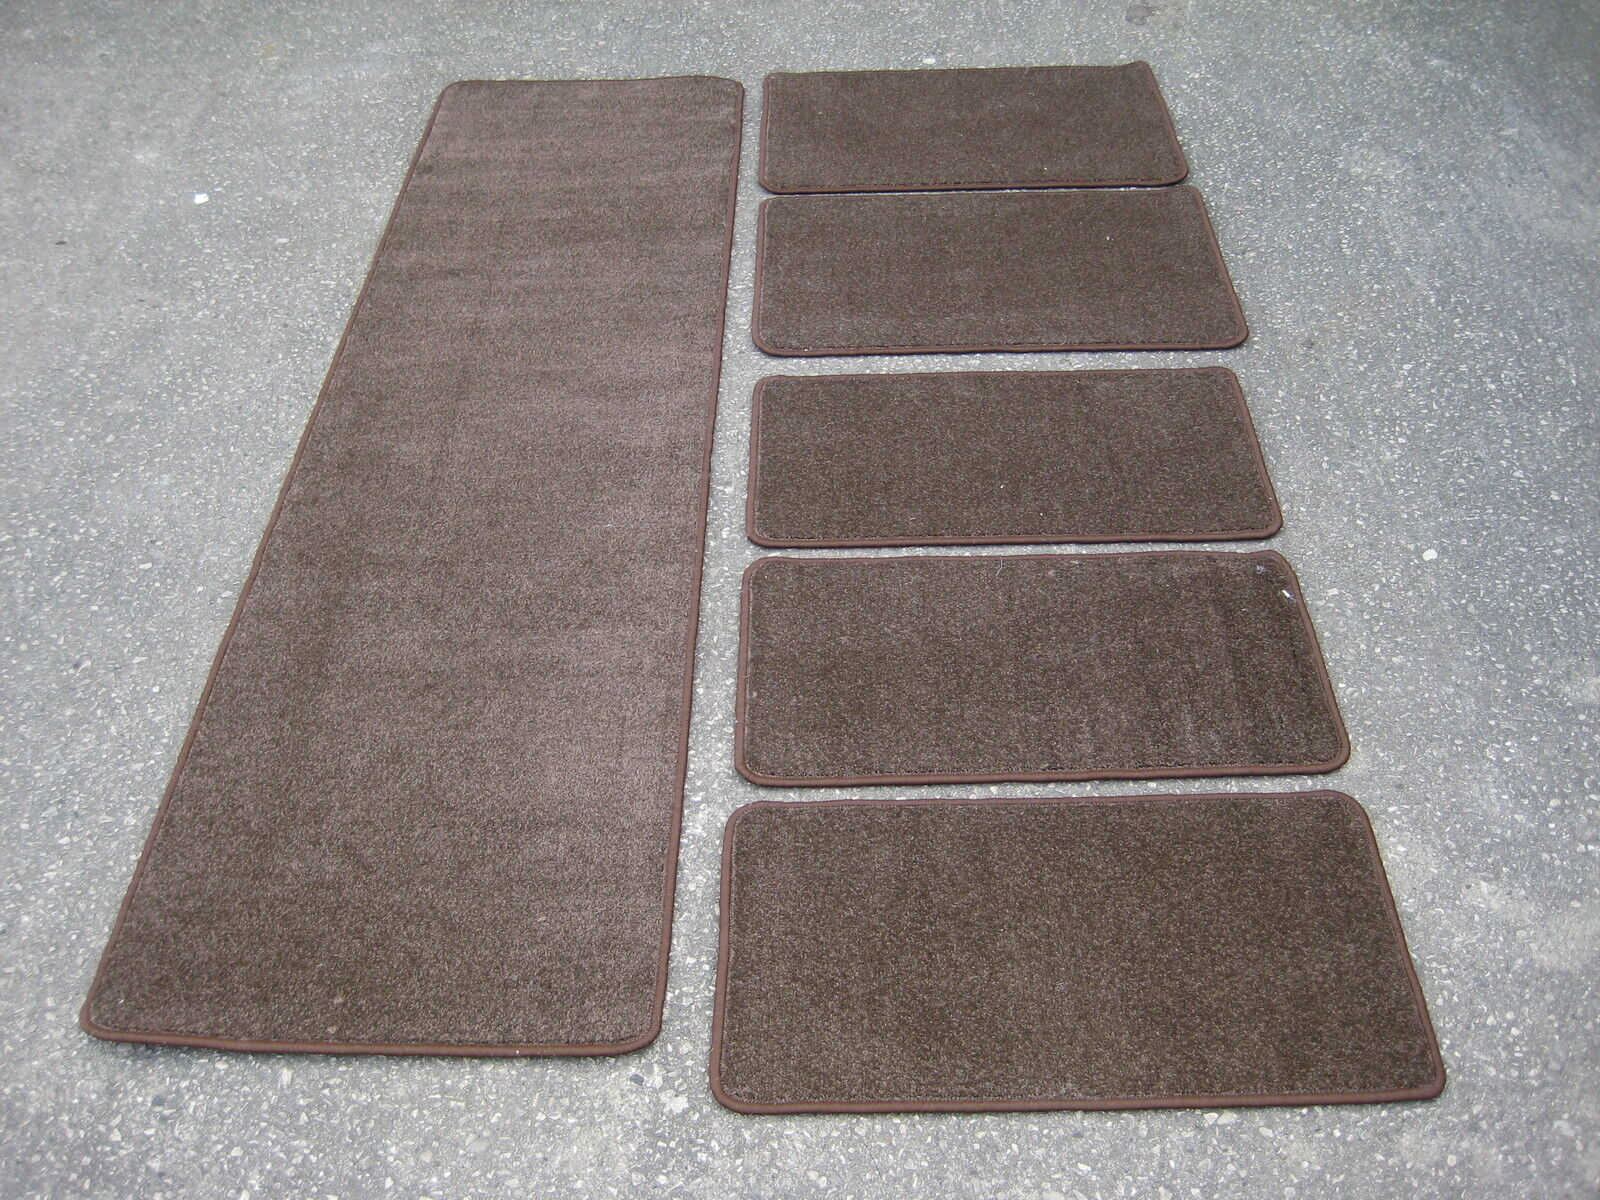 caravane camping car int rieur sol tapis en marron. Black Bedroom Furniture Sets. Home Design Ideas